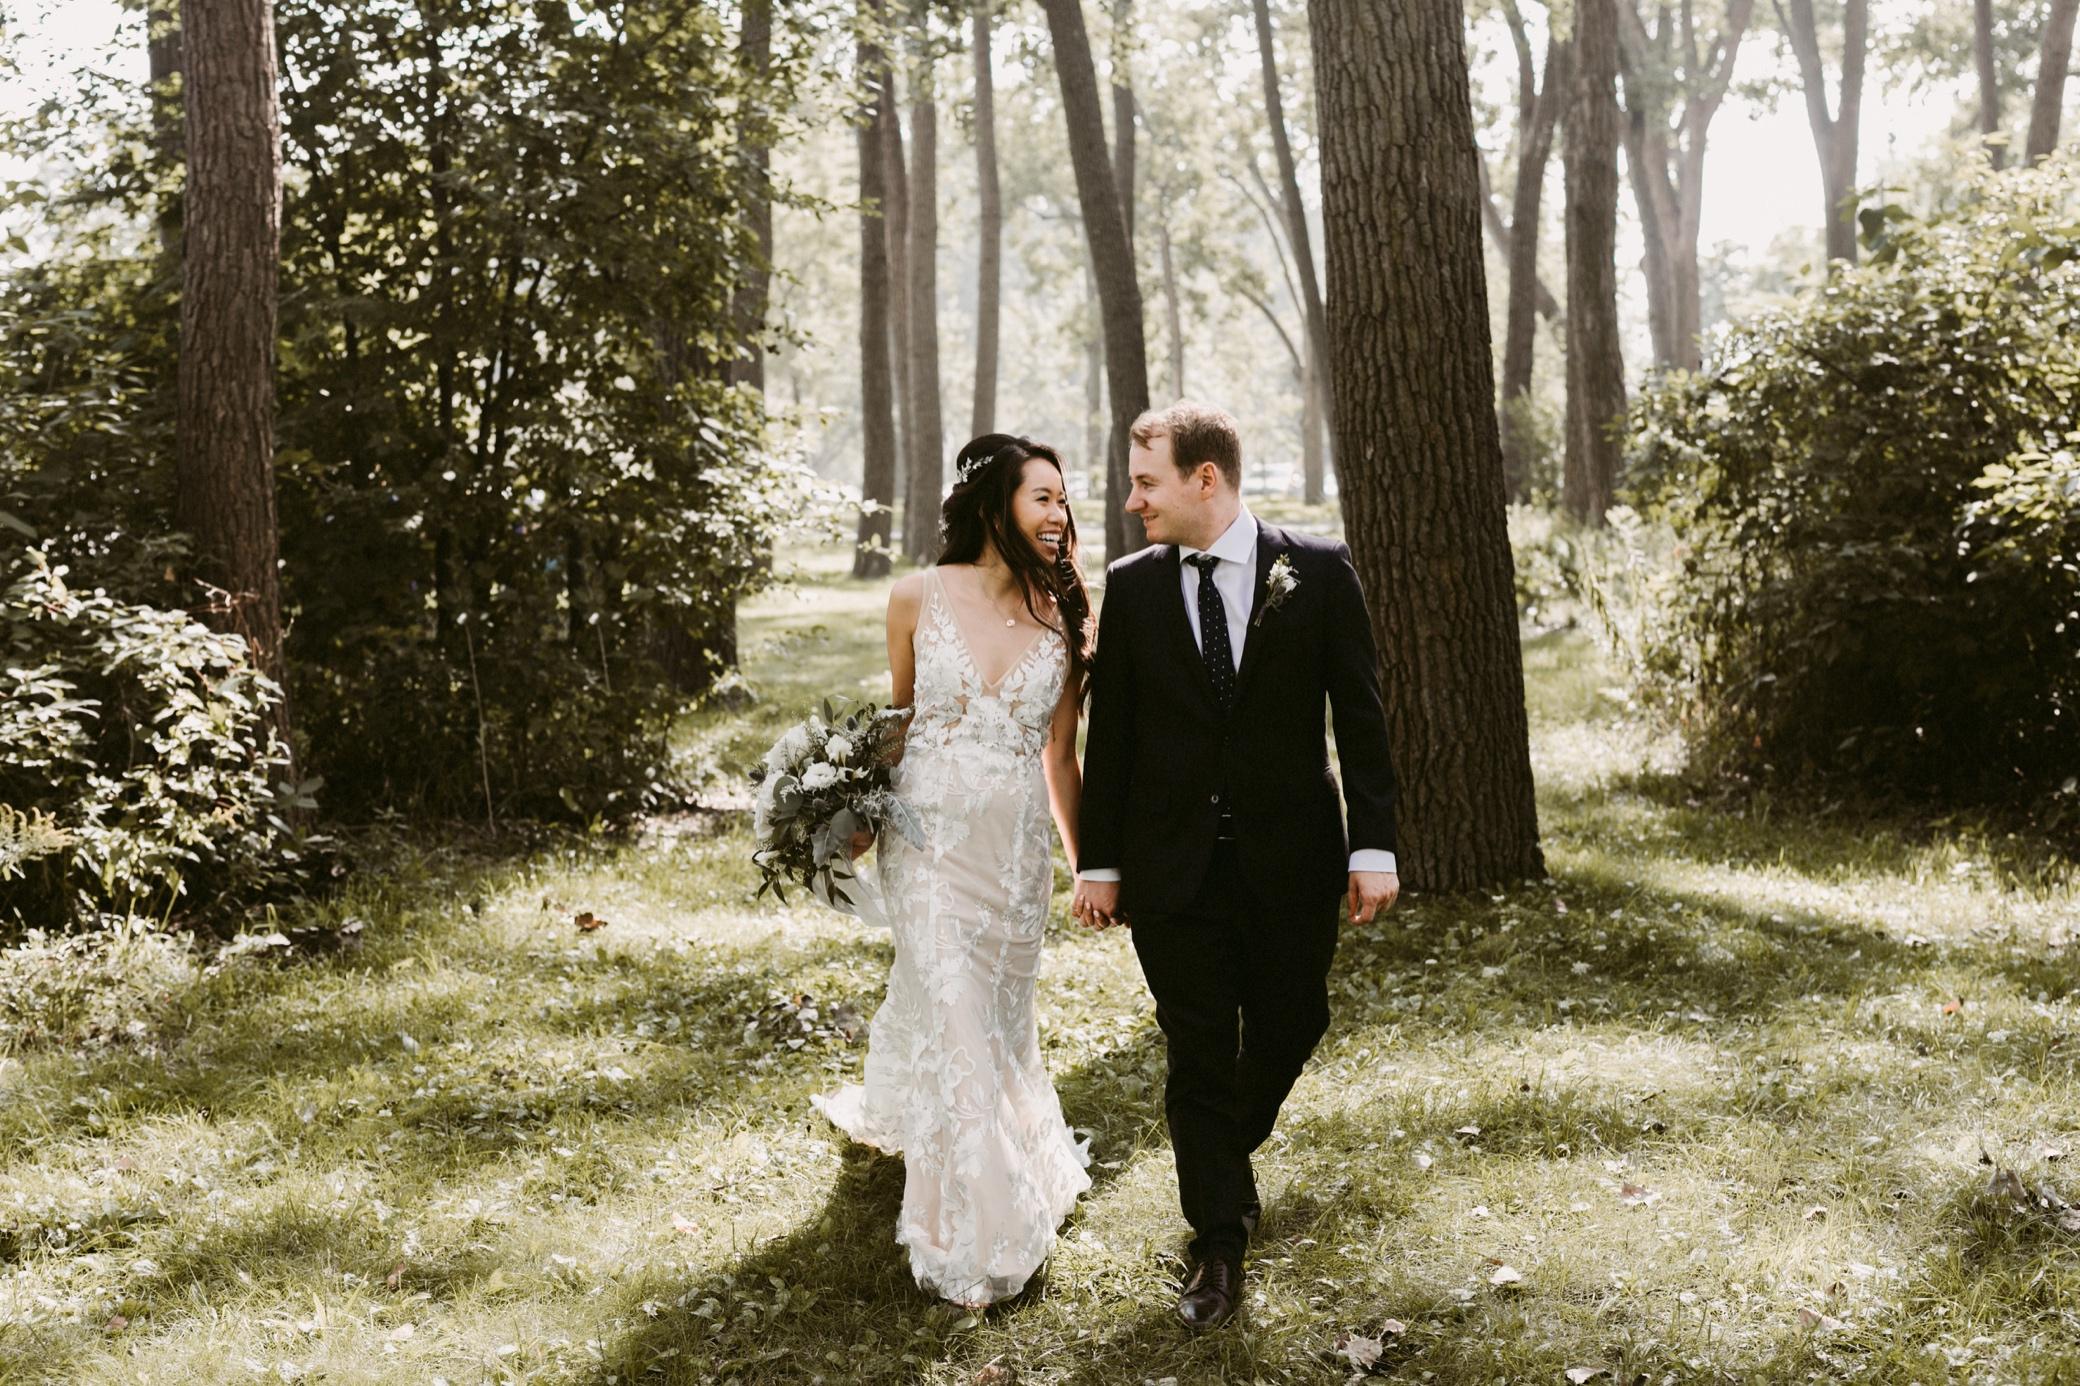 038_The Broadview Hotel Wedding (265 of 913).jpg